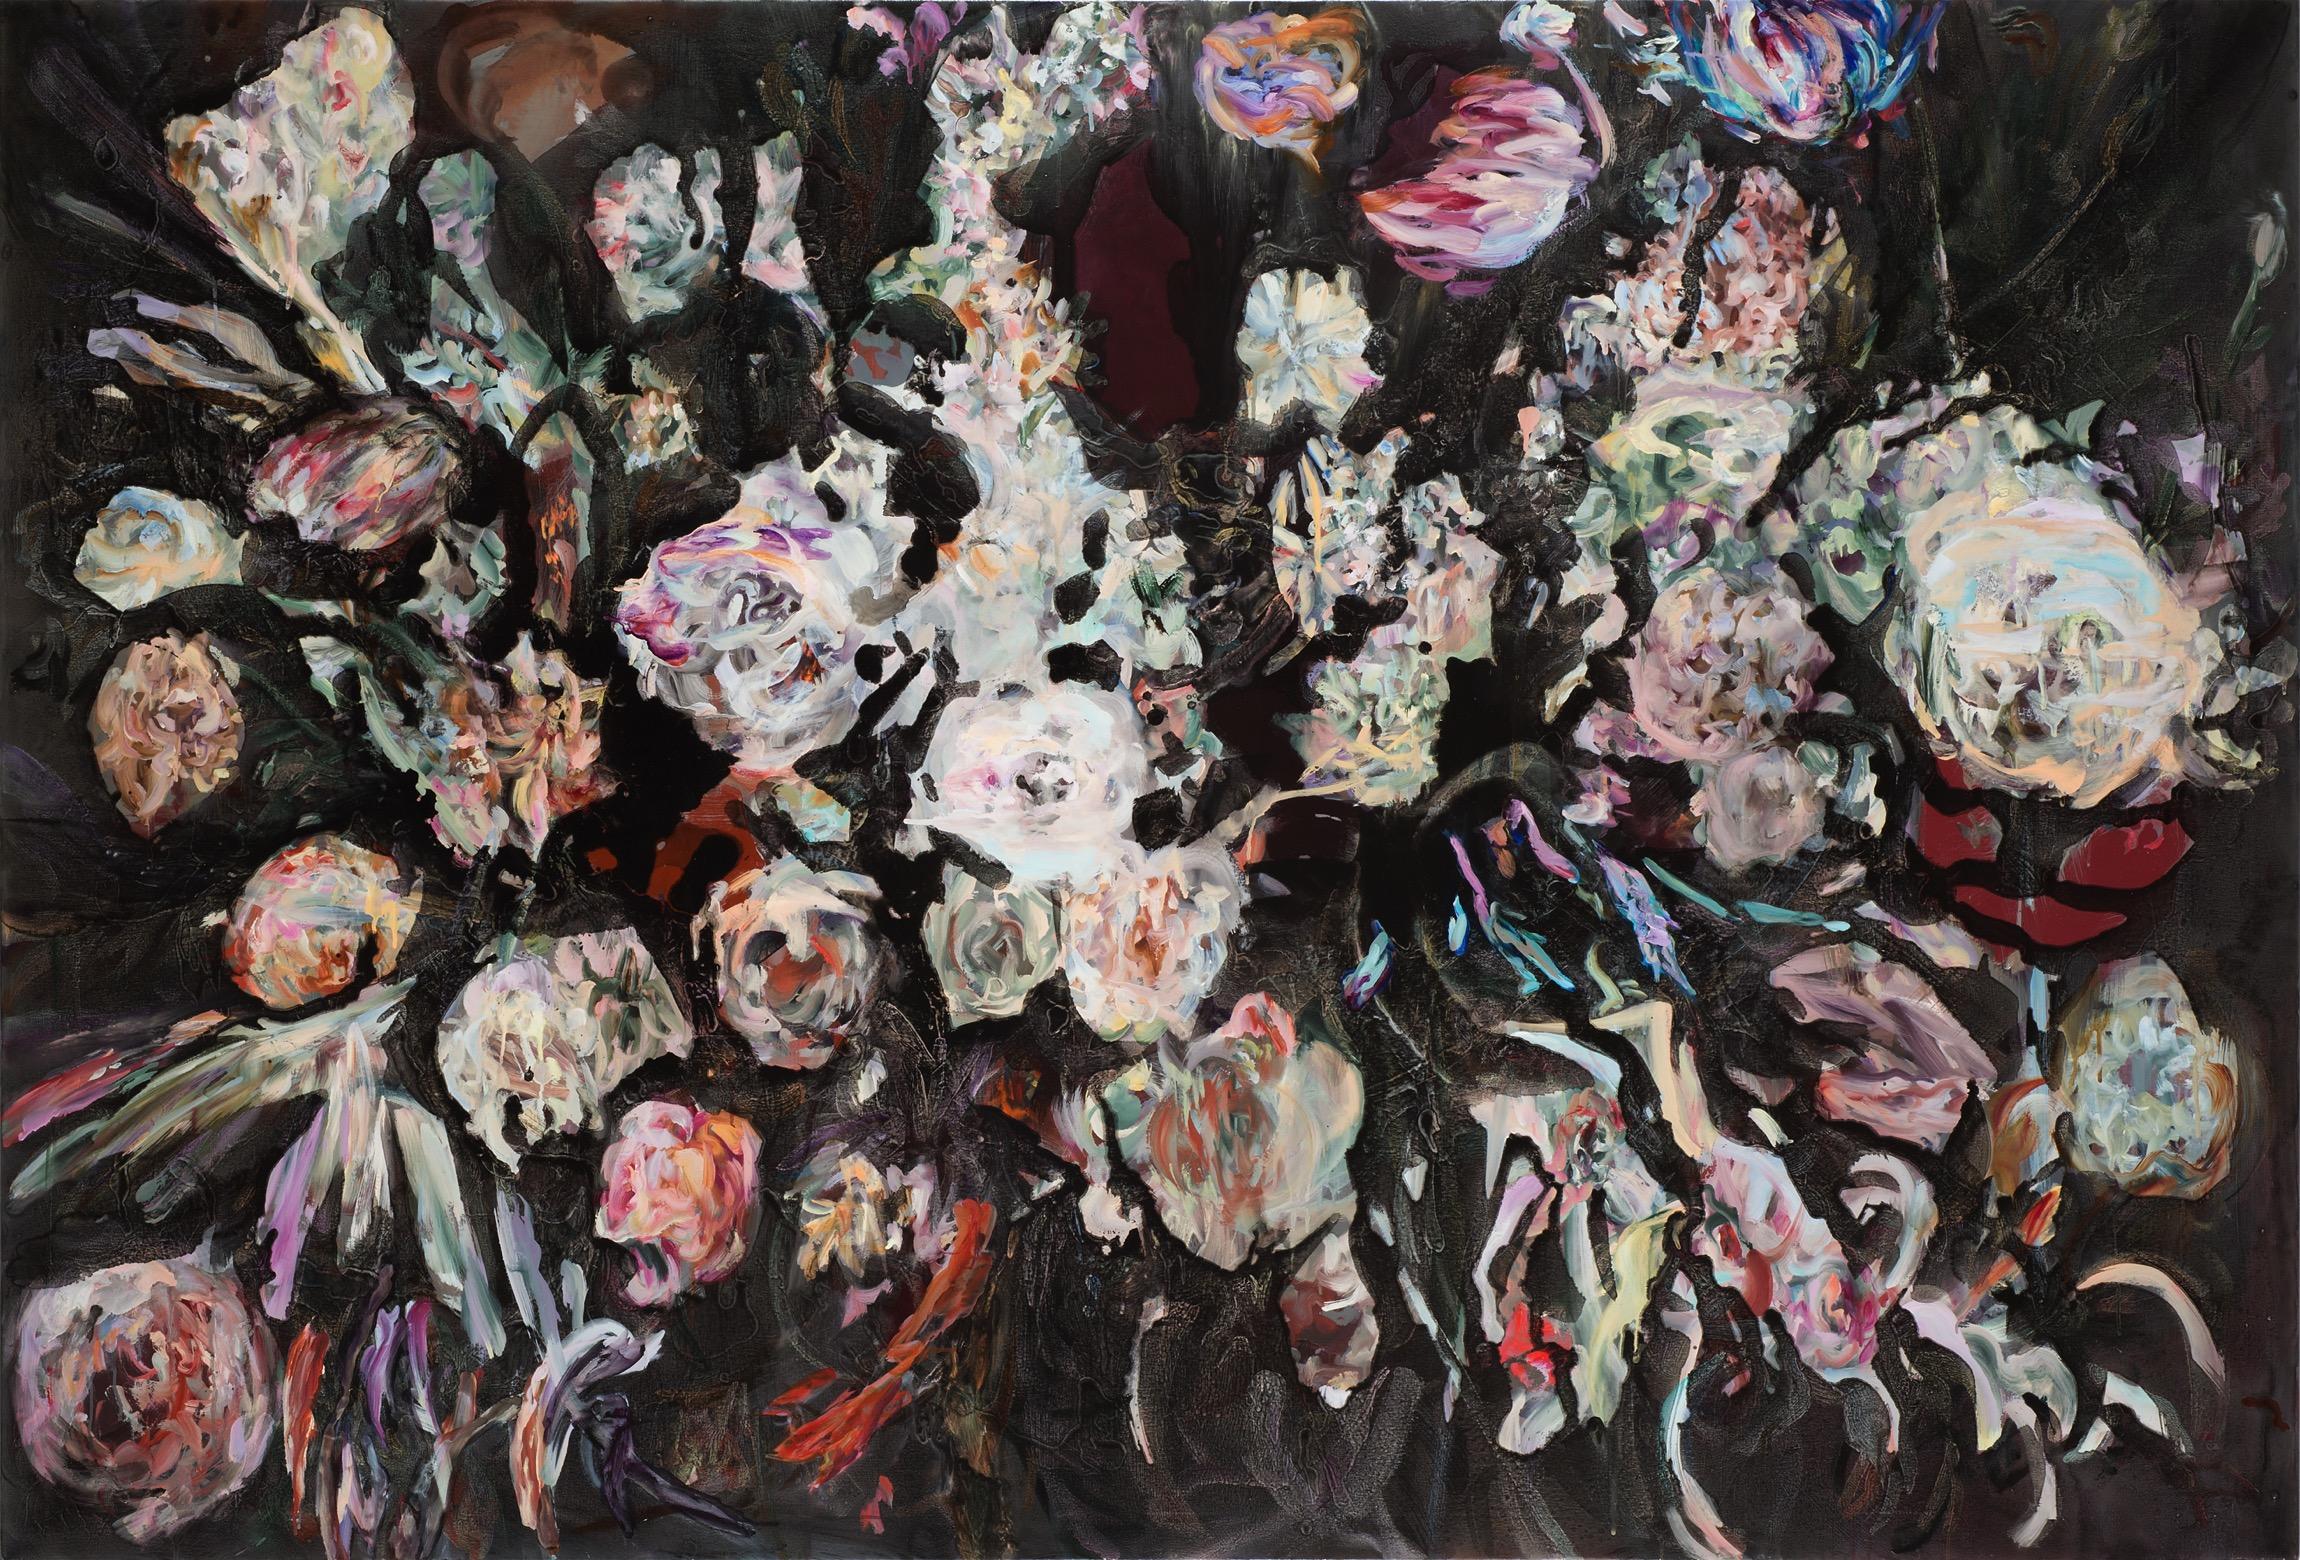 2014 Alisa Margolis The Disappearance